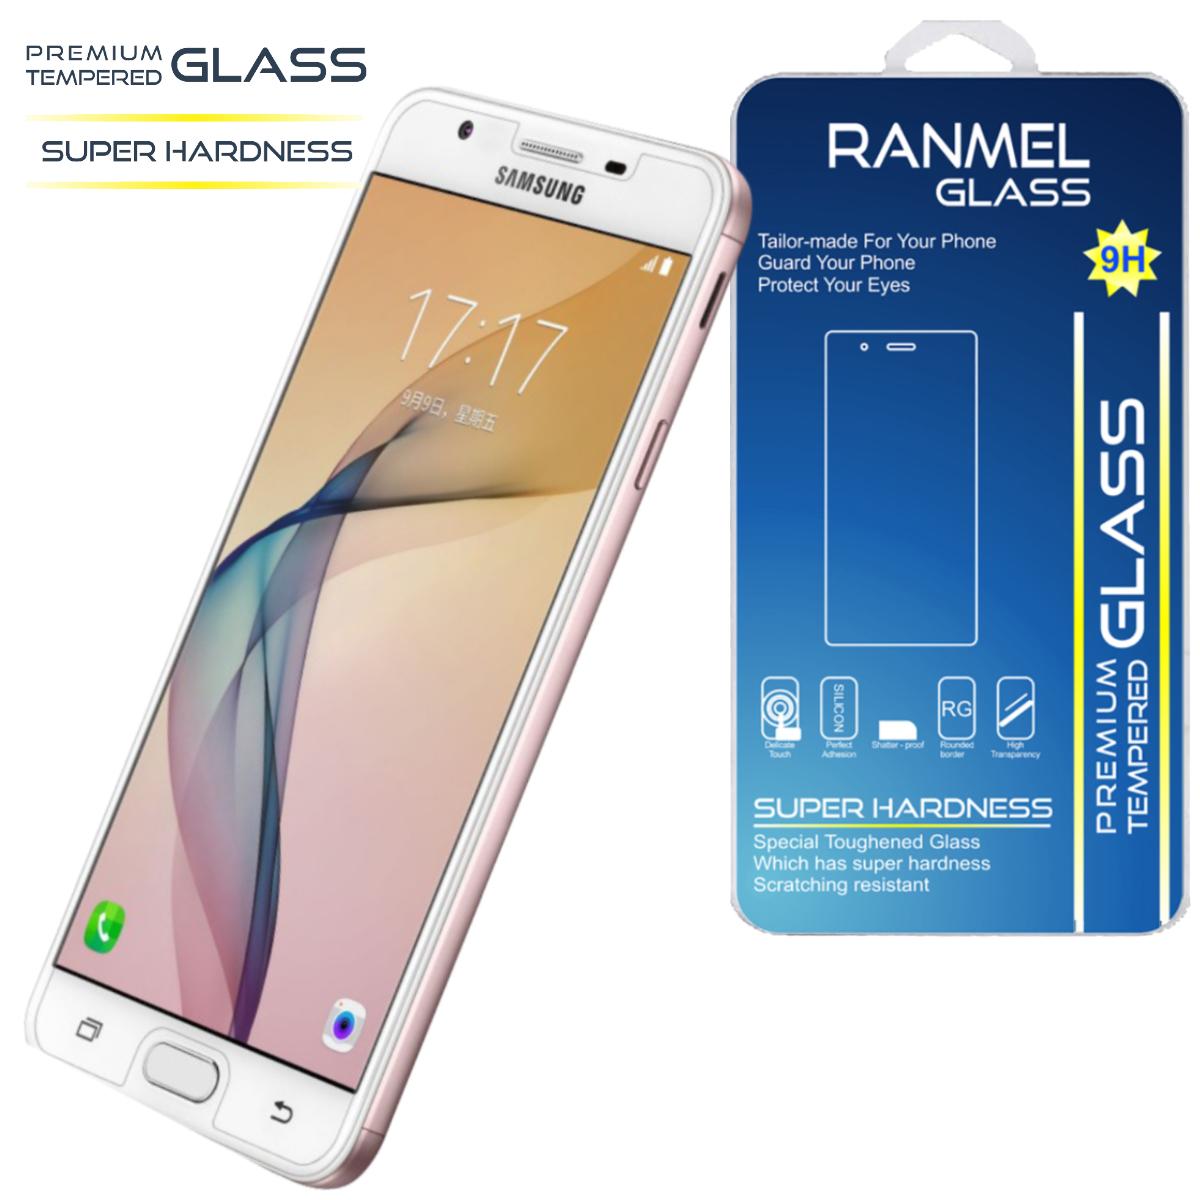 ... Ranmel Glass Tempered Samsung Galaxy C5 Premium Tempered Glass Source Anti Gores Kaca